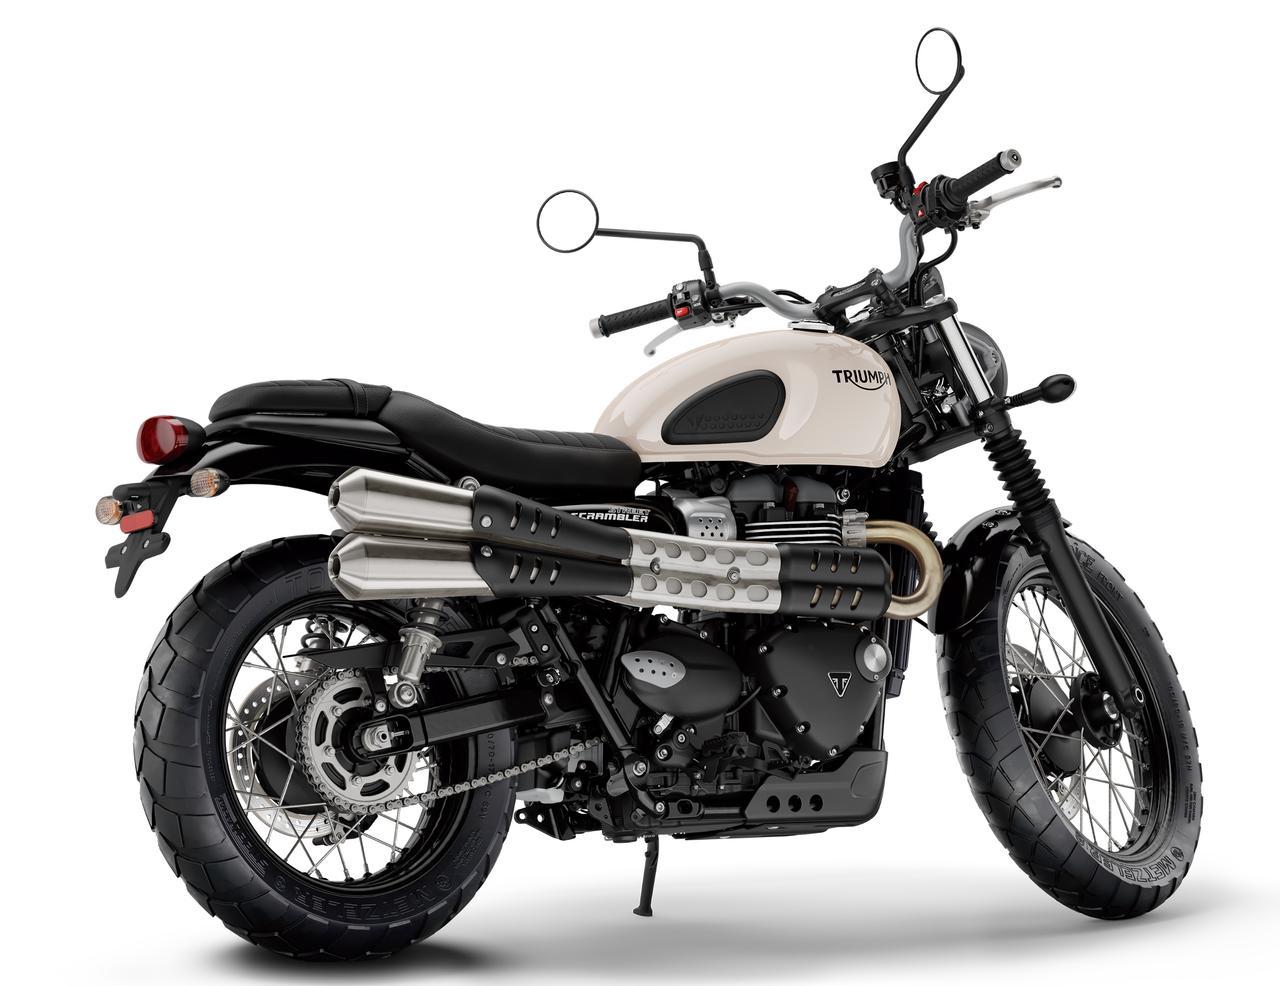 Images : 3番目の画像 - 「古典的で新しい?? 力強さを増して登場『TRIUMPH STREET SCRAMBLER』!」のアルバム - webオートバイ